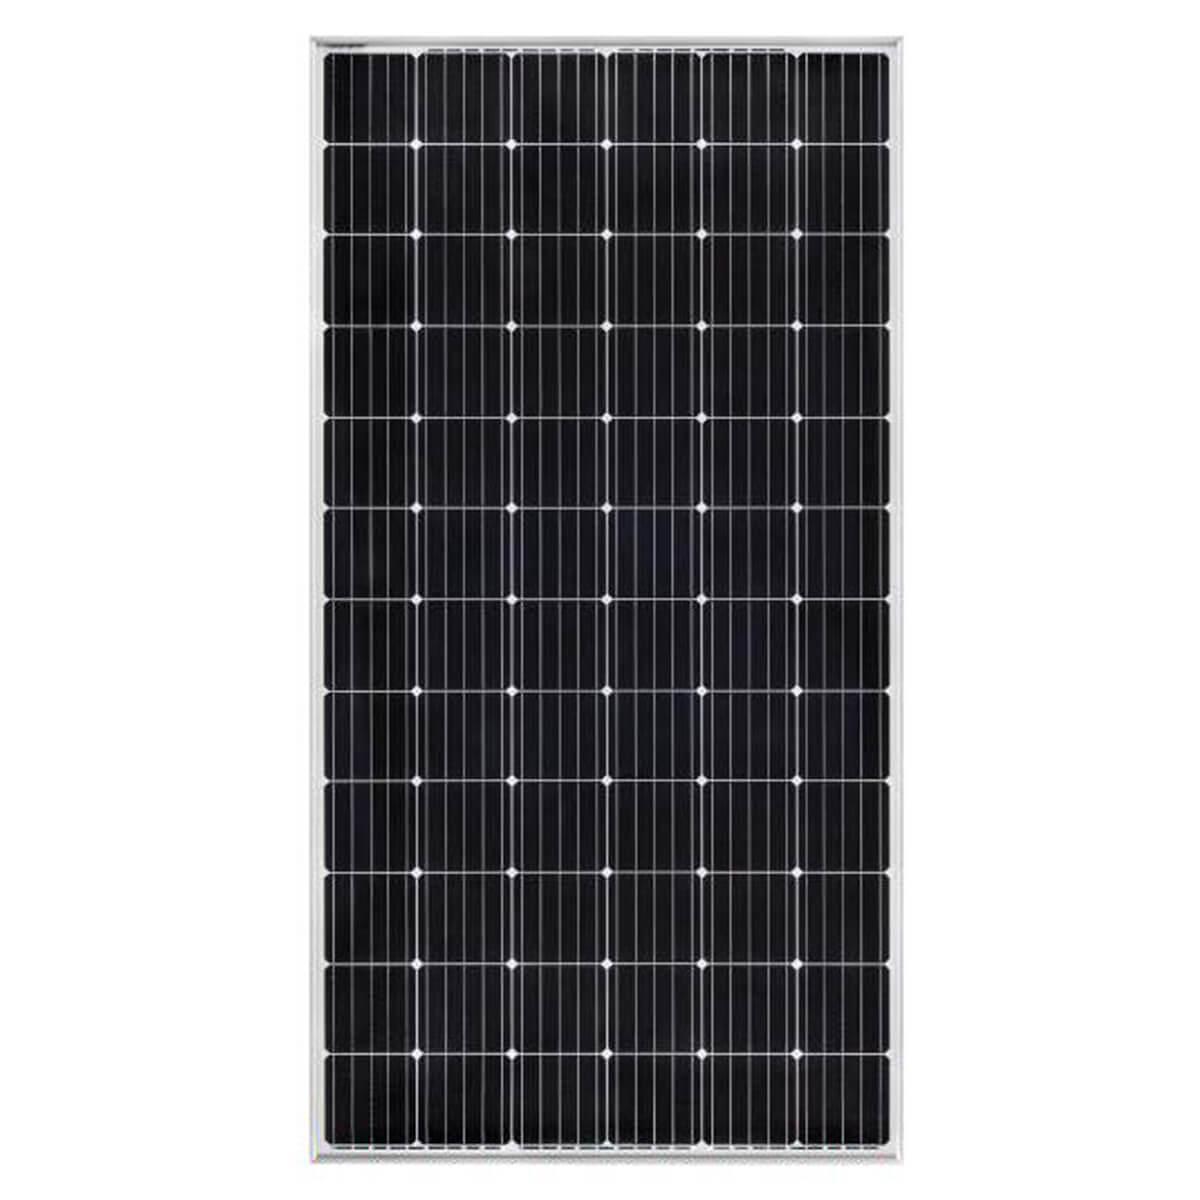 Odul solar 390W panel, odul solar 390Watt panel, Odul solar 390 W panel, odul solar 390 Watt panel, odul solar 390 Watt monokristal panel, Odul solar 390 W watt gunes paneli, odul solar 390 W watt monokristal gunes paneli, odul solar 390 W Watt fotovoltaik monokristal solar panel, odul solar 390W monokristal gunes enerjisi, odul solar OSMp72-390W panel, ÖDÜL SOLAR 390 WATT